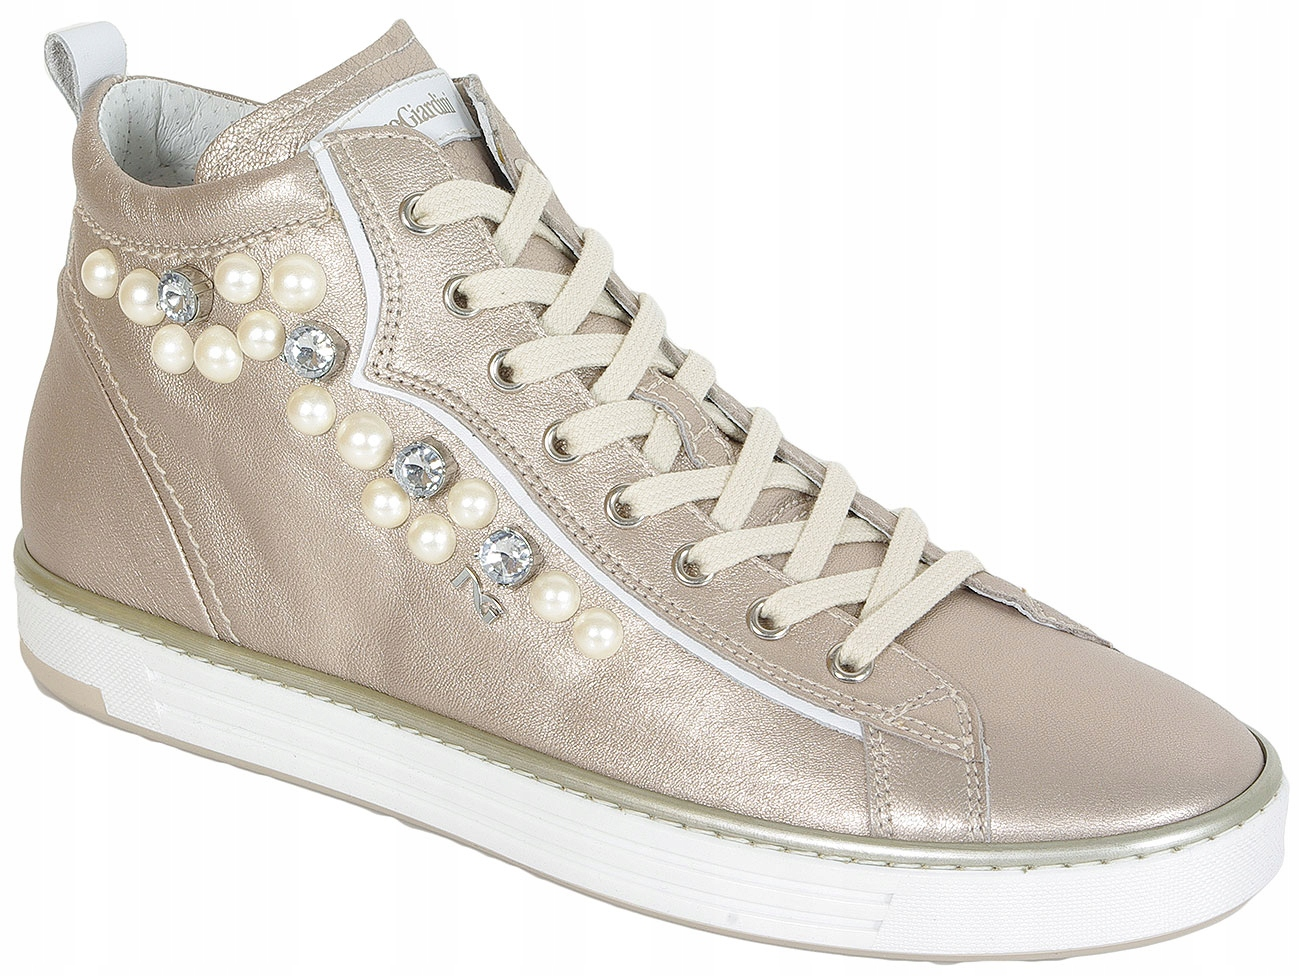 best website 5d3ea 19e4f NeroGiardini SALE P805271D Rosa Antico sneakers 40 ...